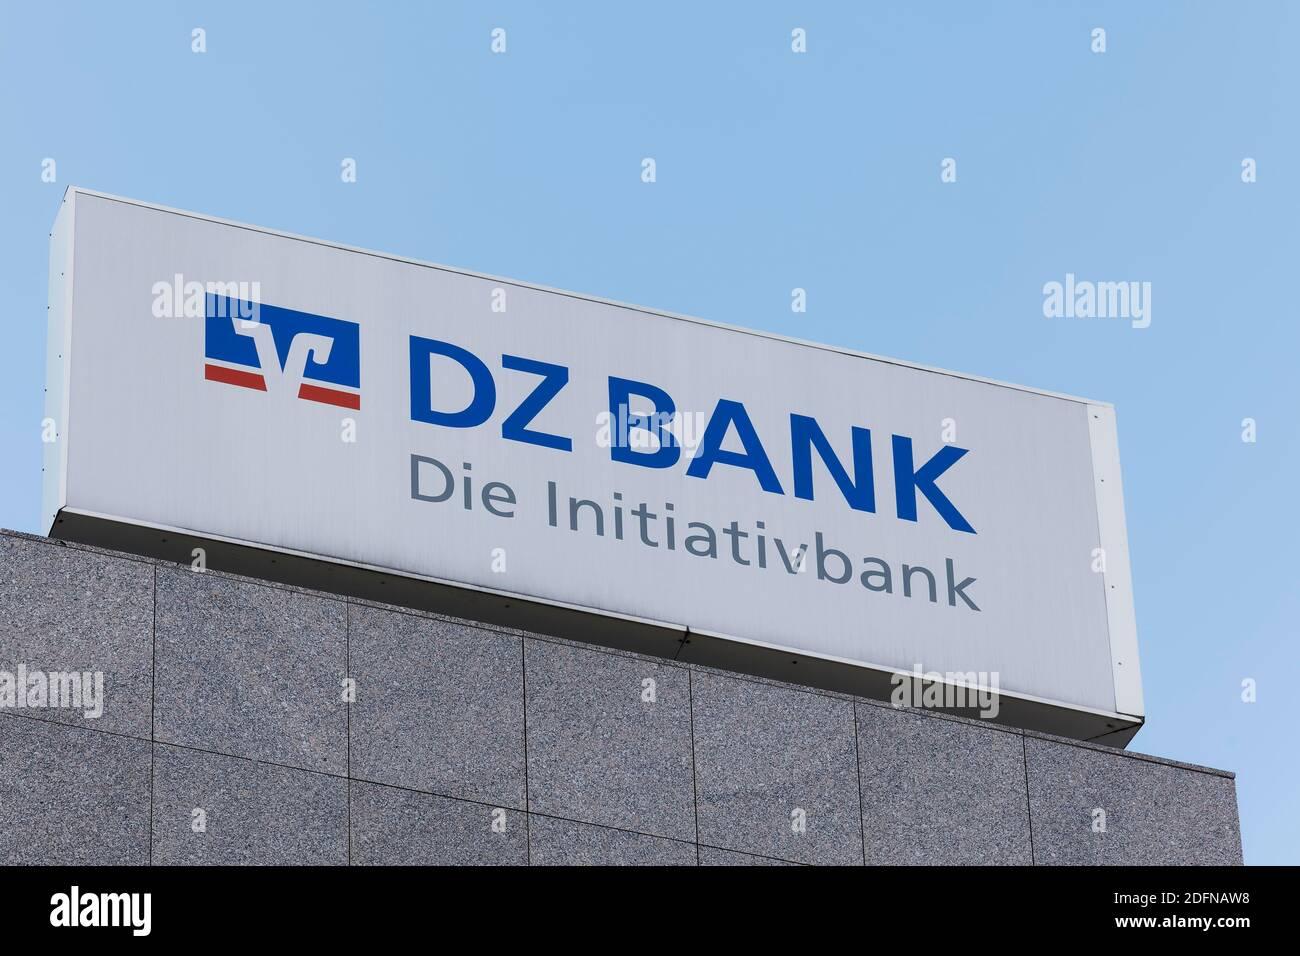 DZ Bank AG, Deutsche Zentral-Genossenschaftsbank, logo at the Duesseldorf branch, North Rhine-Westphalia, Germany Stock Photo